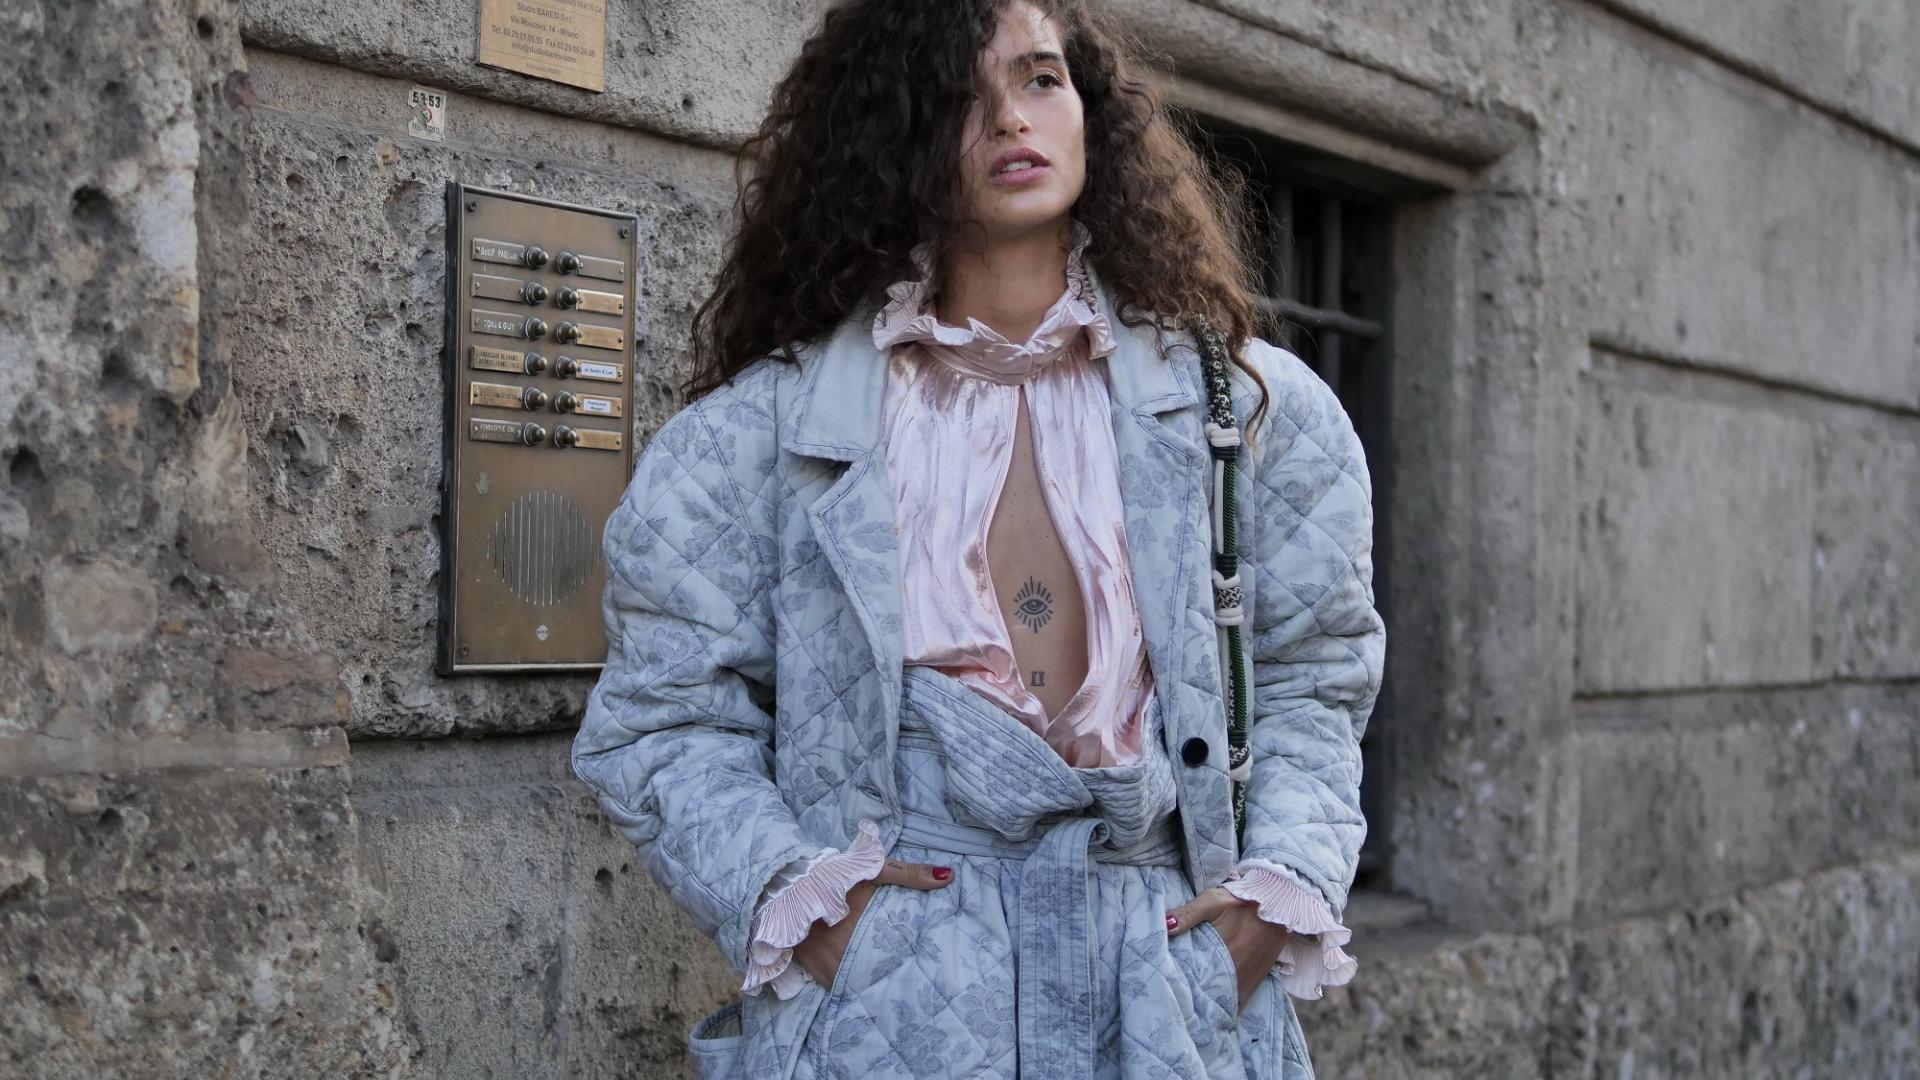 Mailand Fashionweek, Streetstyle, Model, Chiara Scelsi